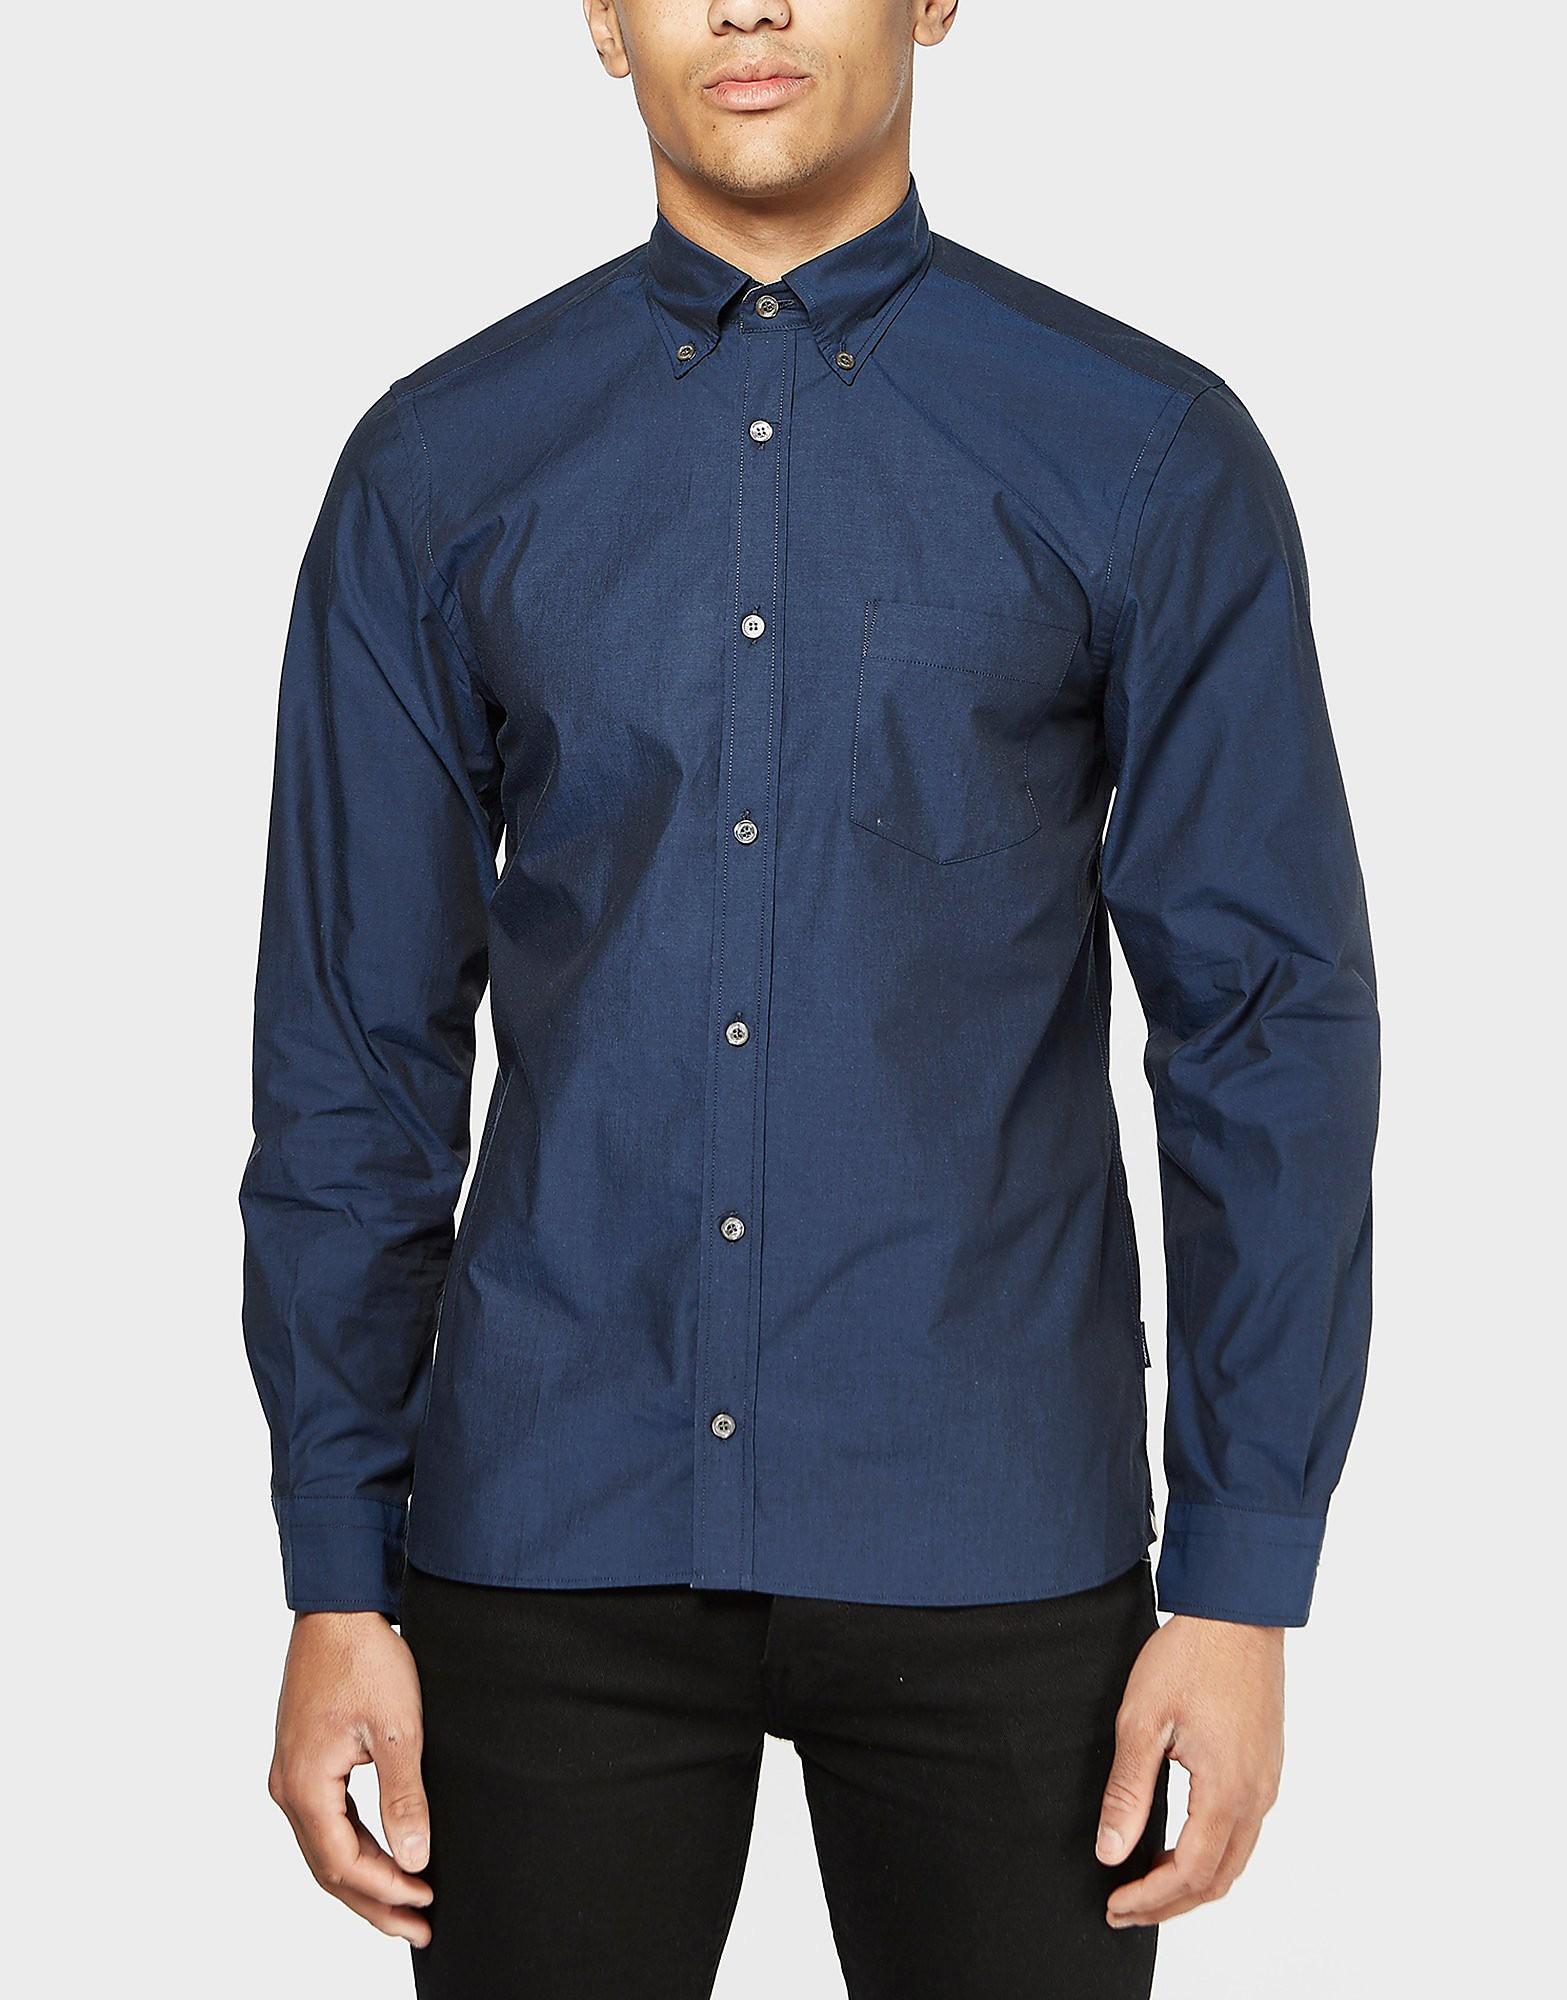 Aquascutum Eshton Poplin Shirt